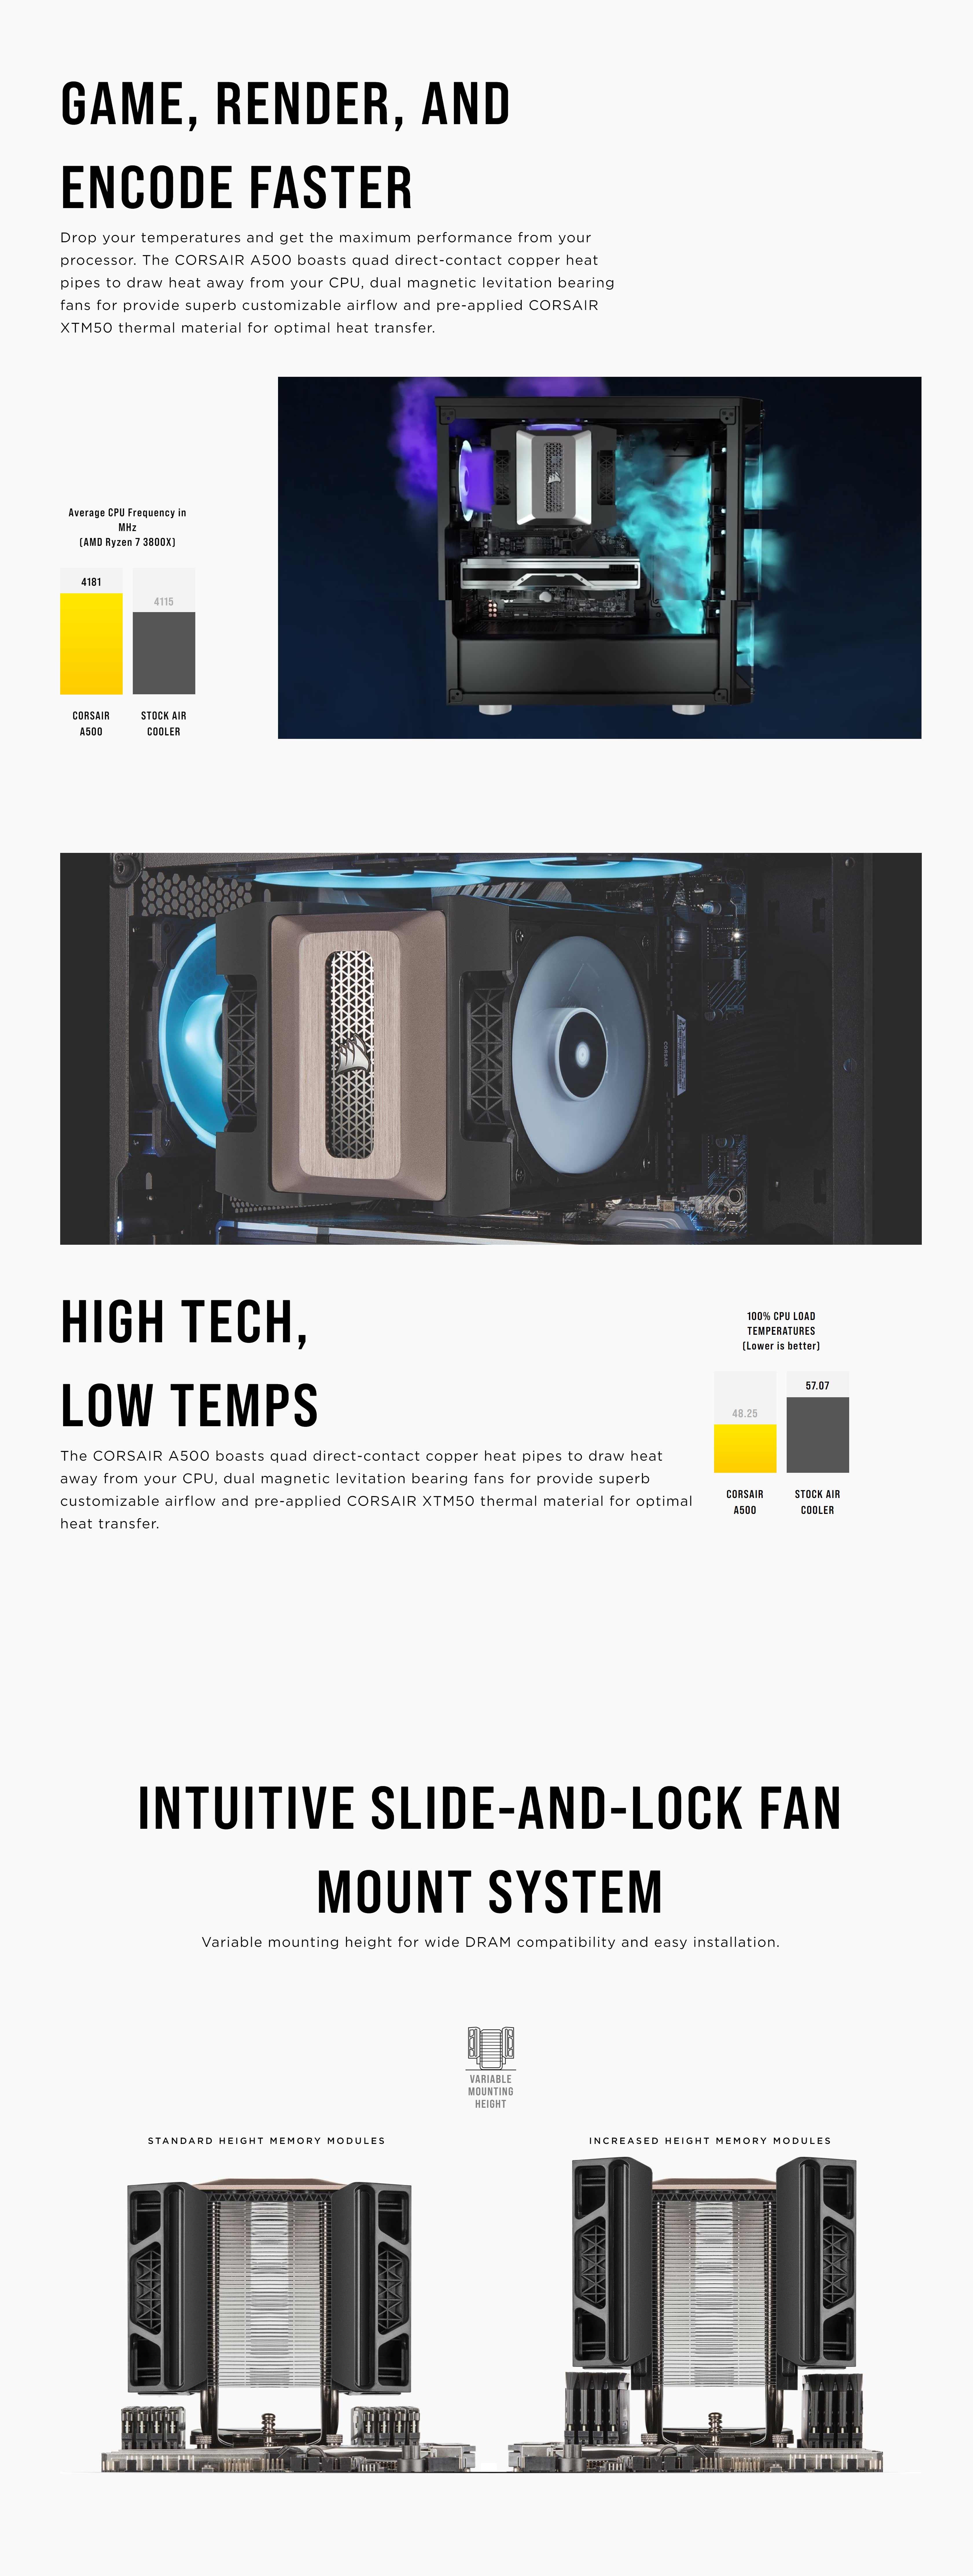 screencapture-corsair-us-en-Categories-Products-Liquid-Cooling-Air-Cooling-A500-Dual-Fan-CPU-Cooler-p-CT-9010003-WW-2020-02-17-14_57_26.jpg